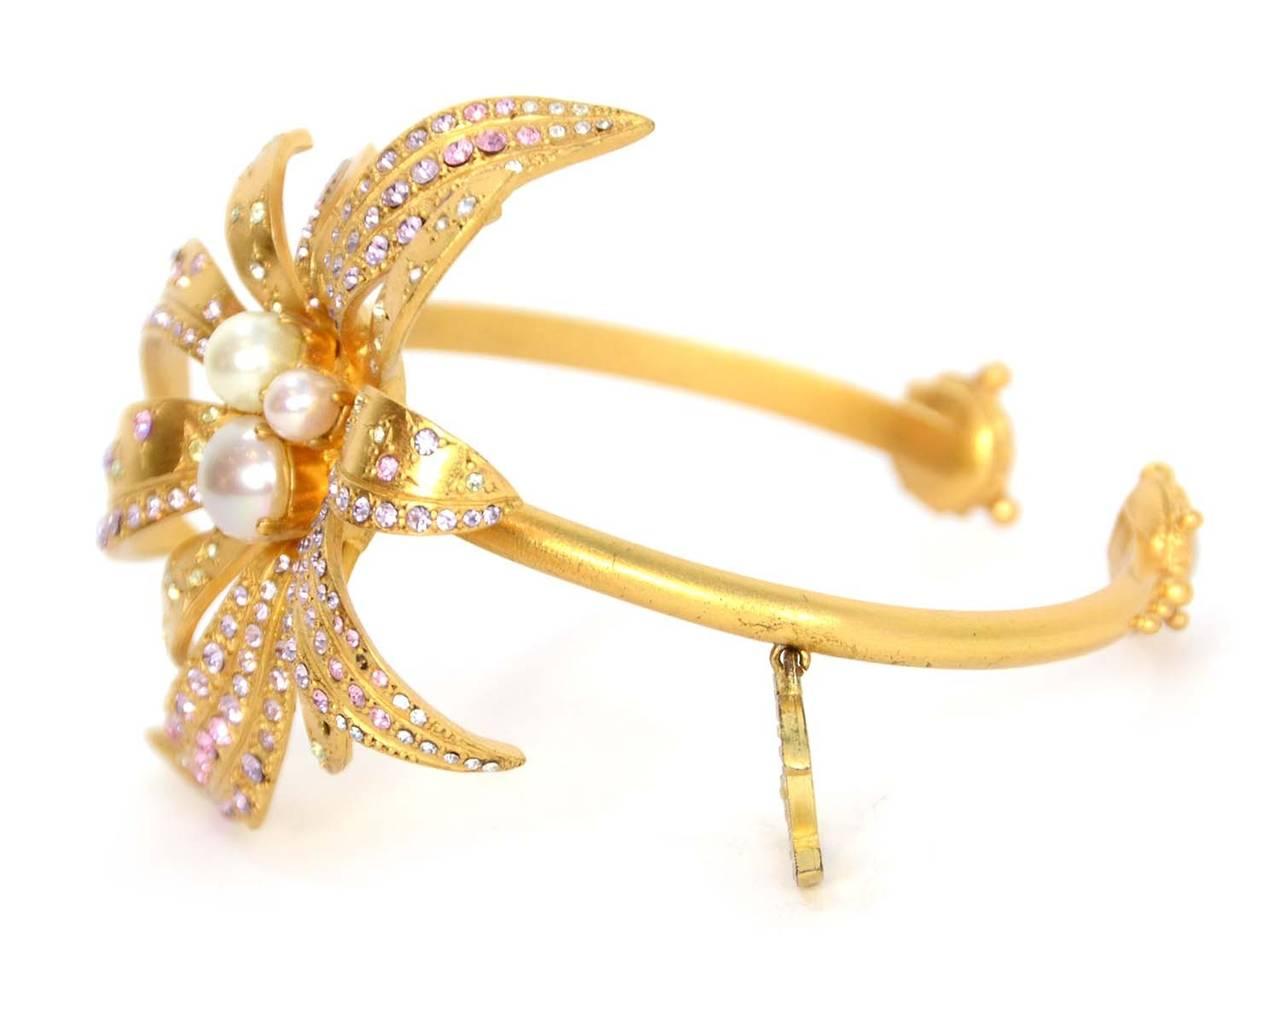 CHANEL 2002 Gold Bracelet w/Pink Rhinestone Flower & Pearls 2